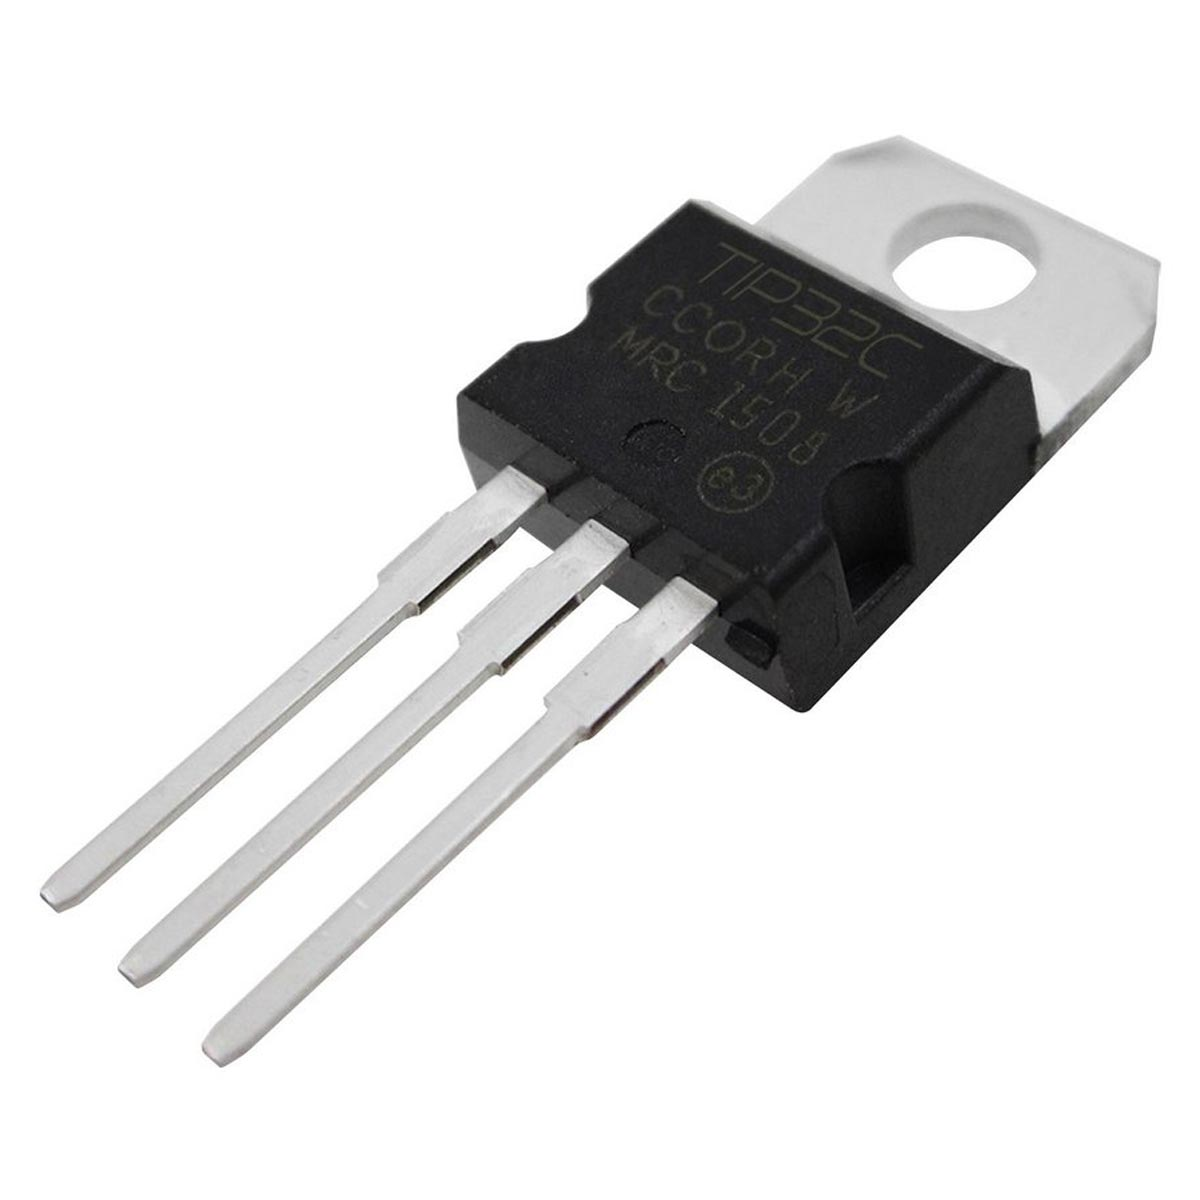 Transistor PNP TIP32c 100v 3A Power To-220